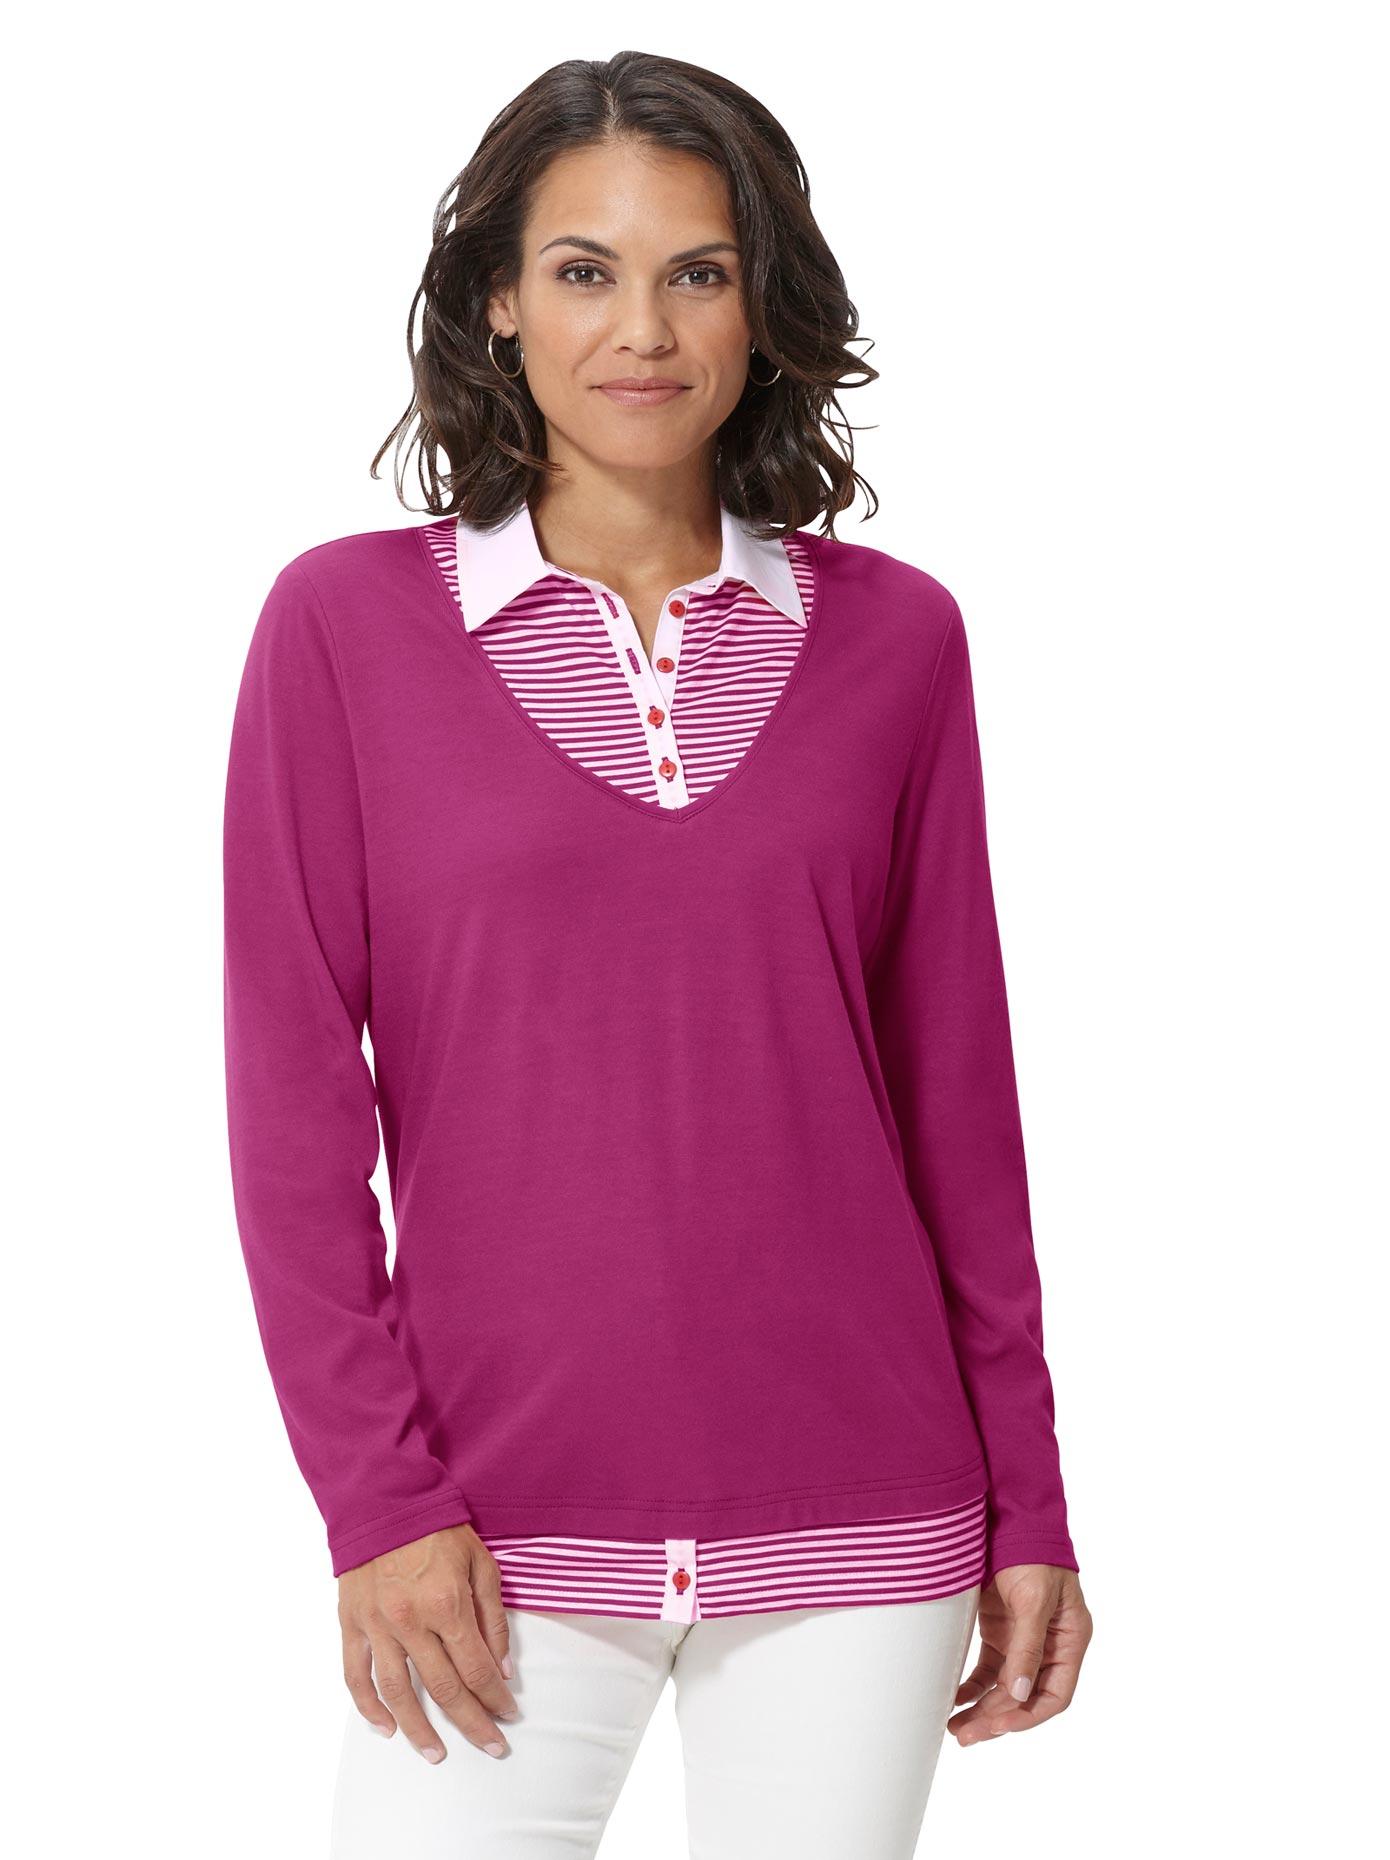 Casual Looks 2-in-1-Shirt im attraktiven Look | Bekleidung > Shirts > 2-in-1 Shirts | Lila | Casual Looks